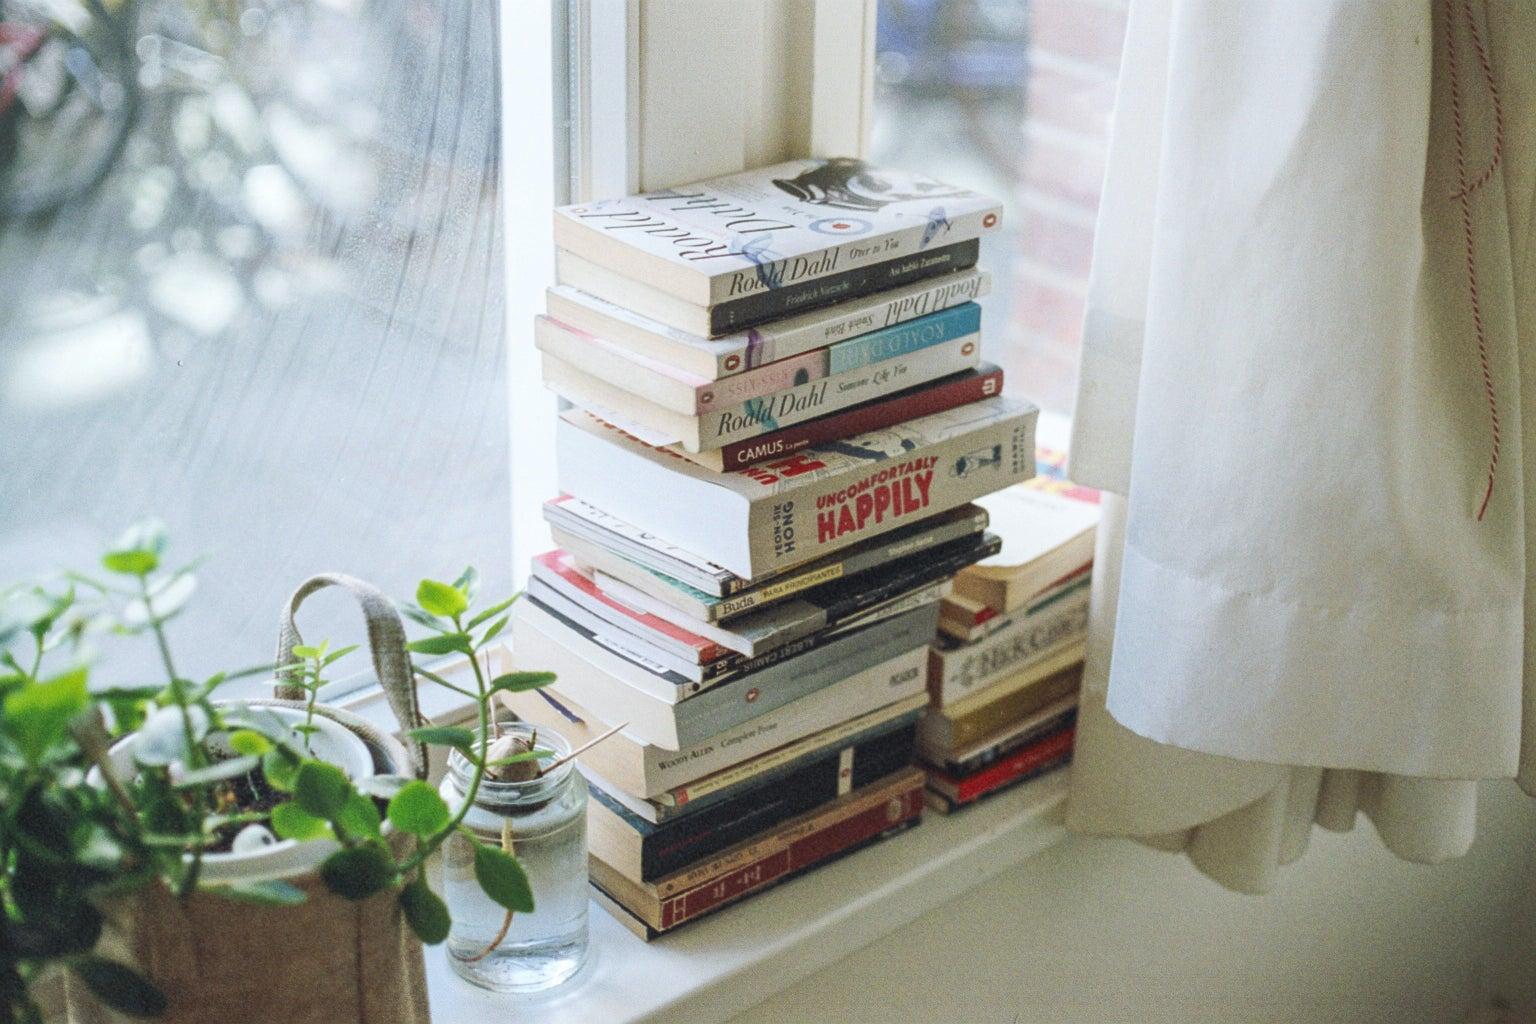 a stack of books on a window shelf